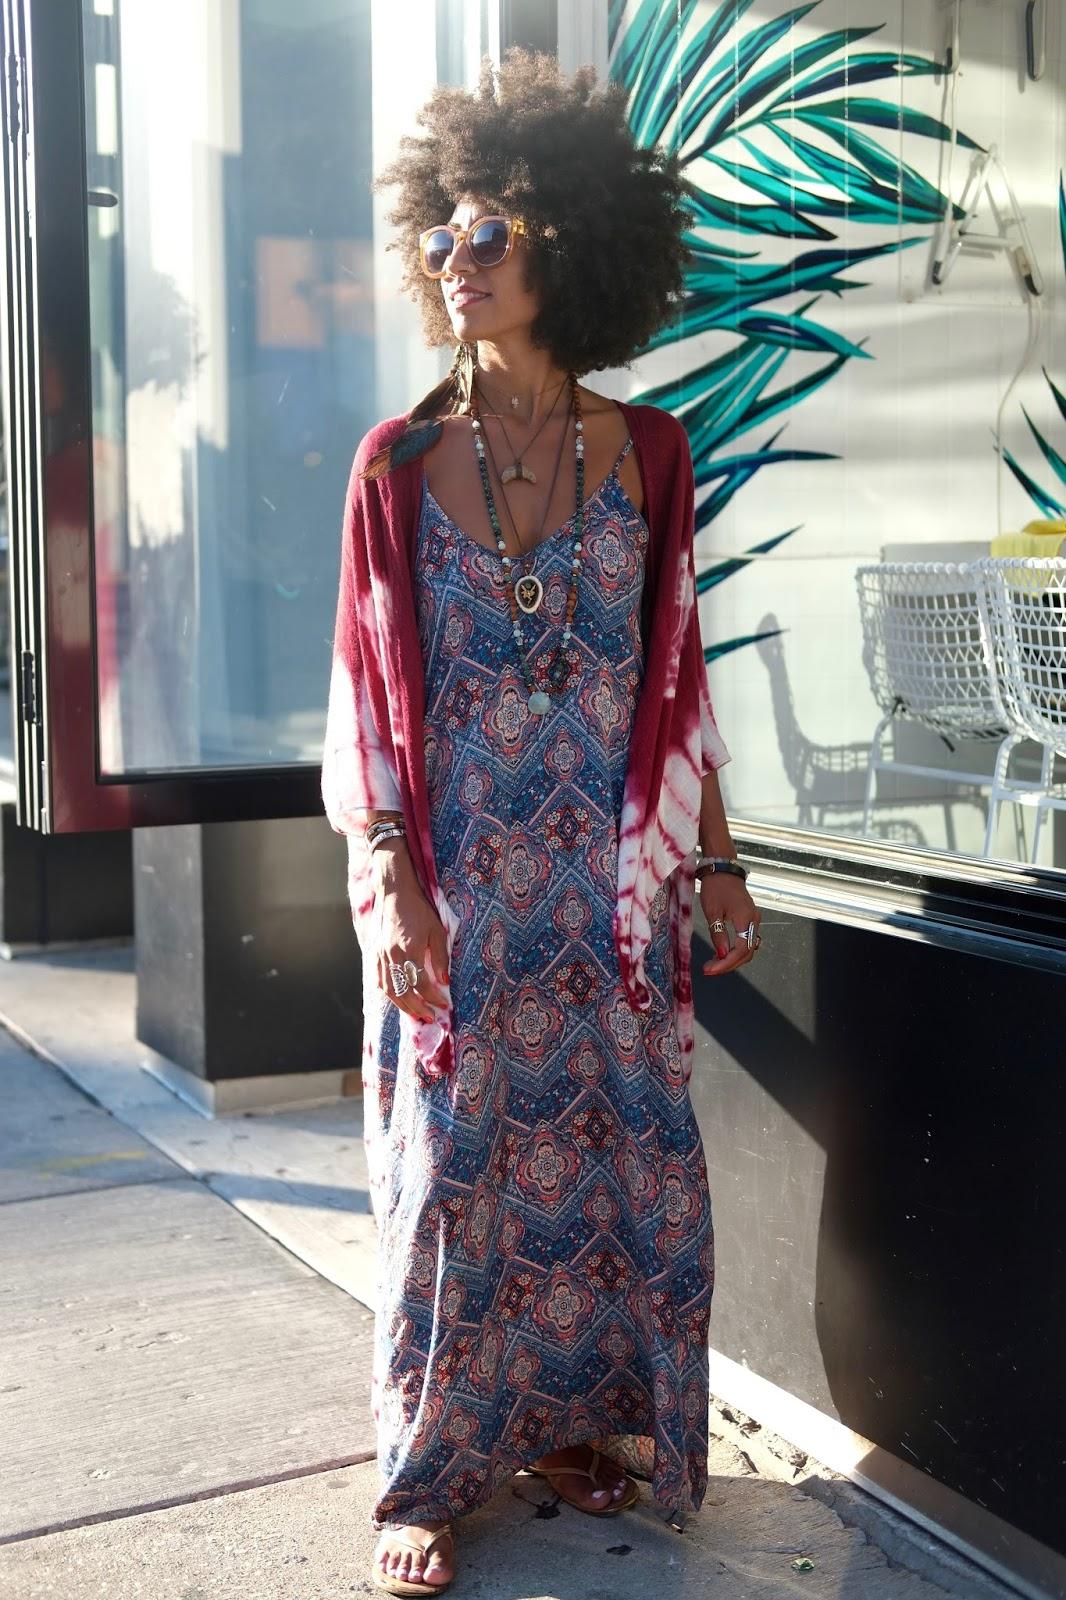 chicago street style fashion